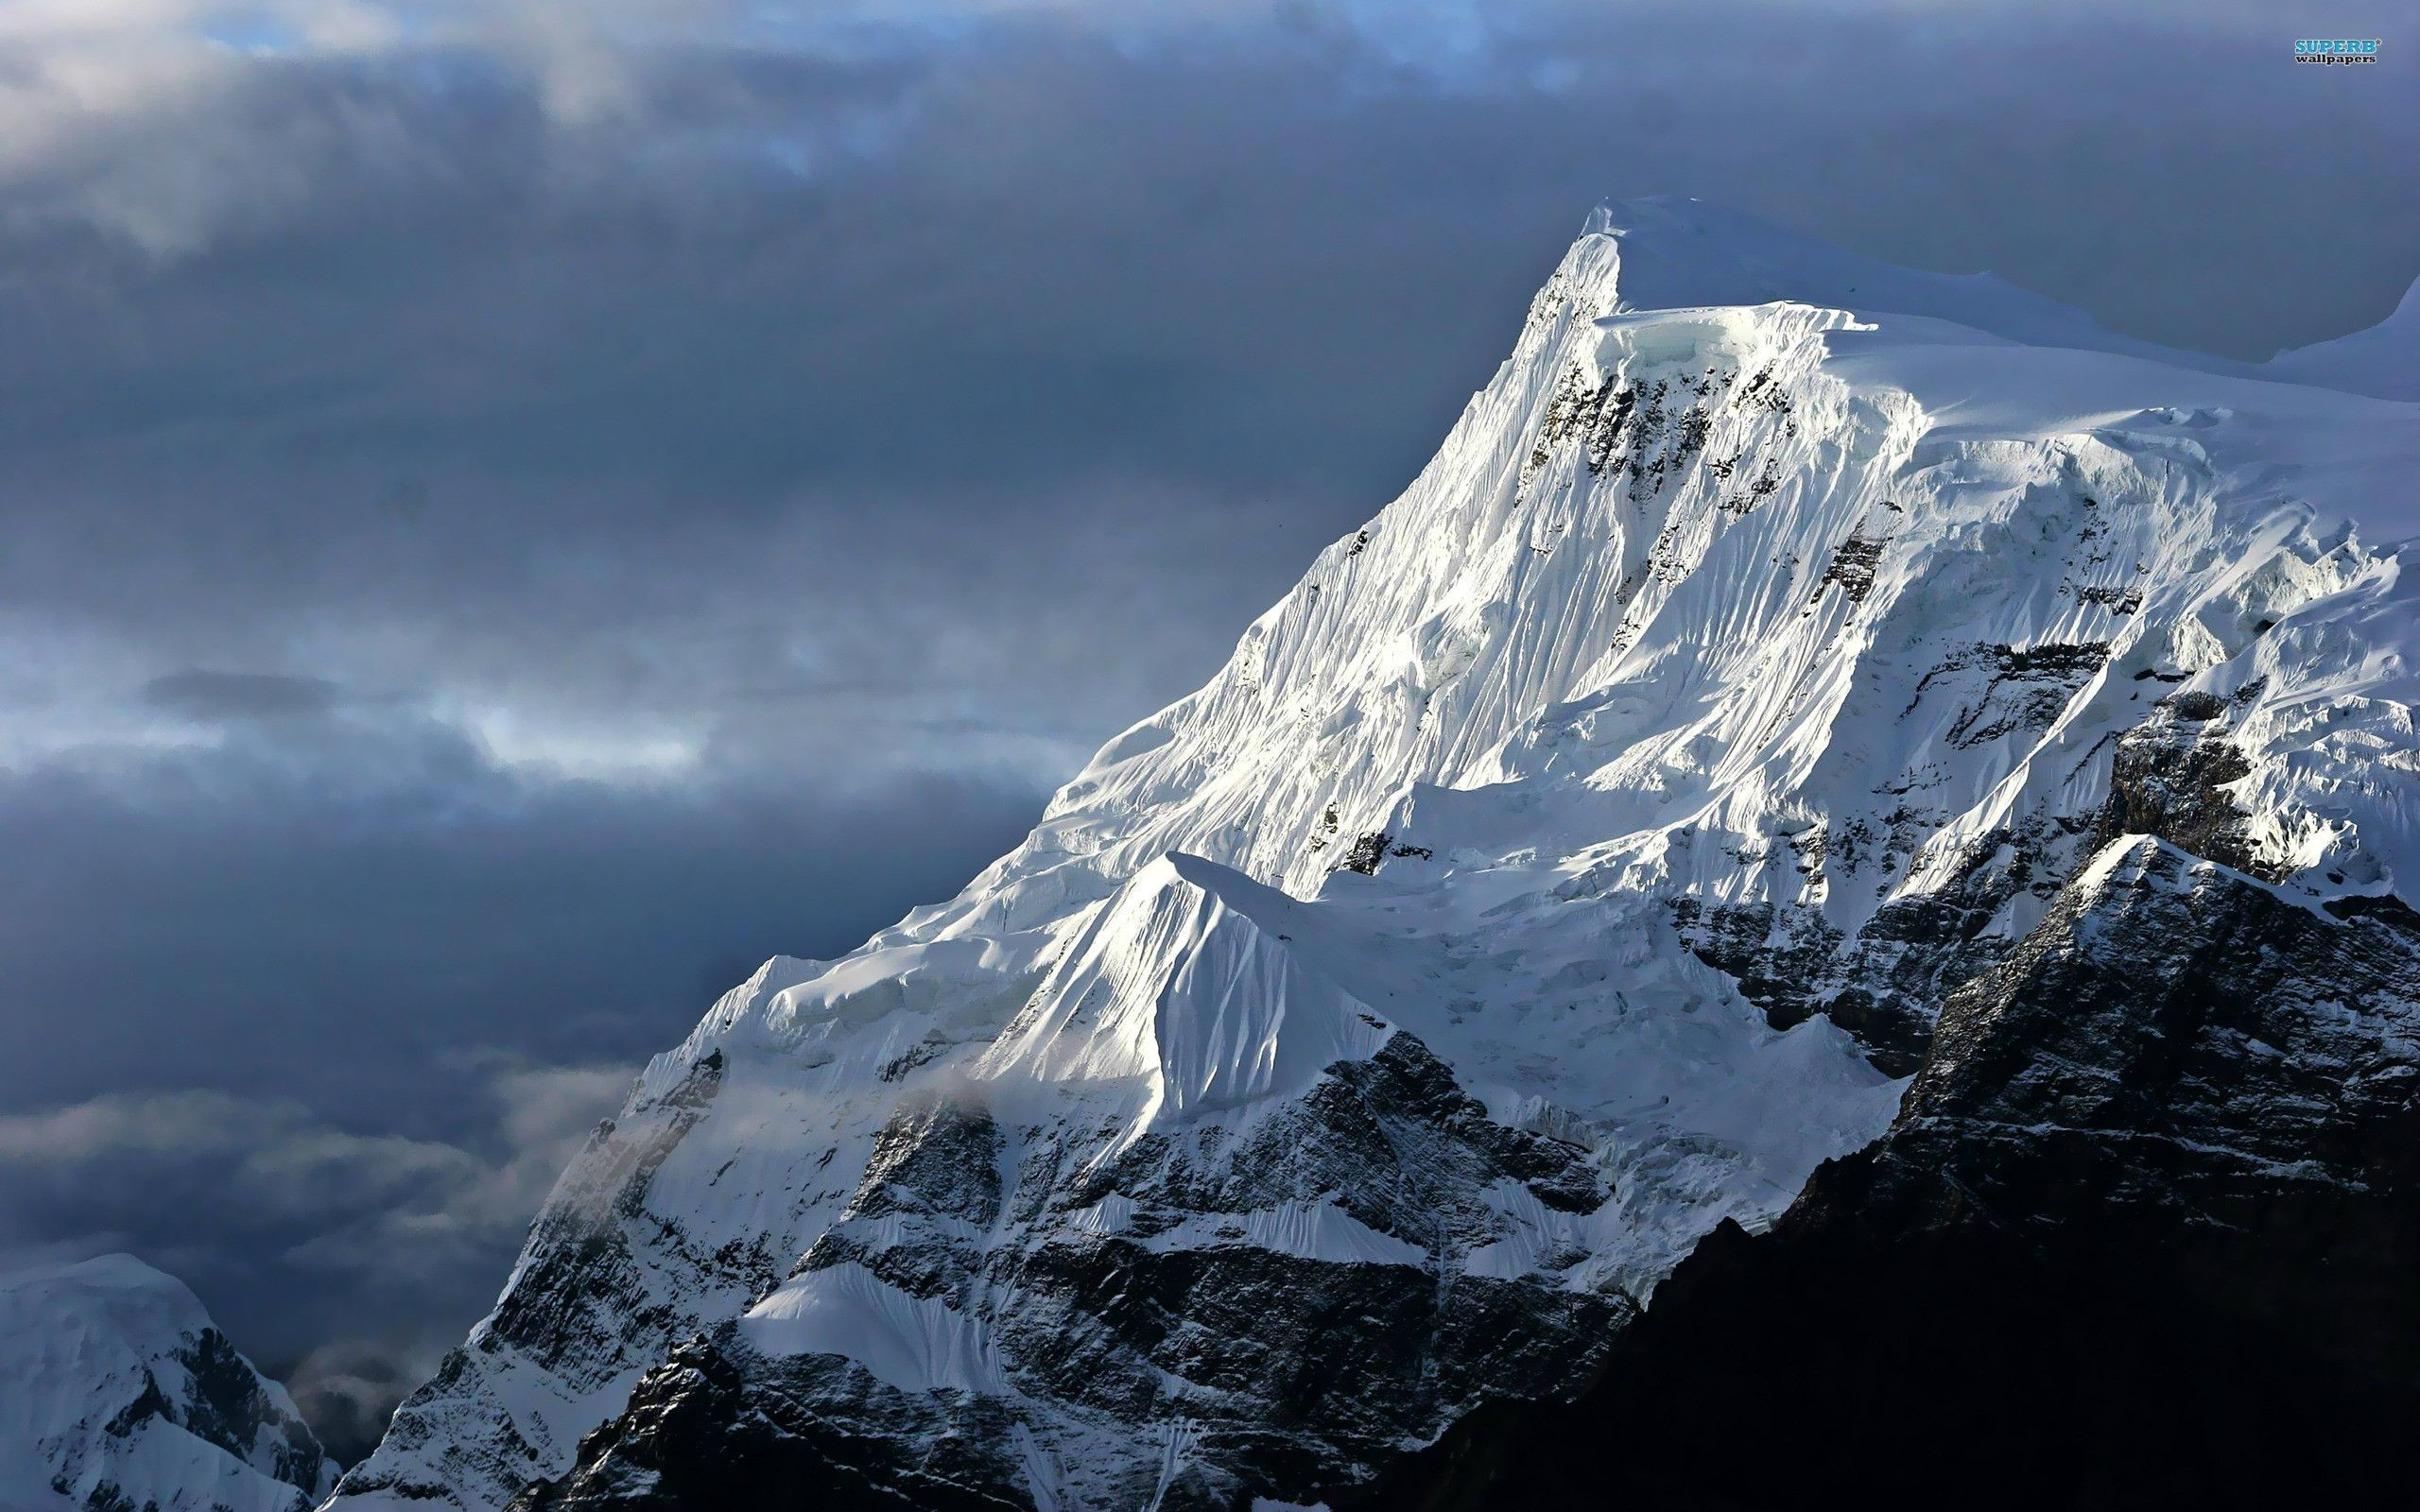 Snow Mountain Wallpapers 1080p